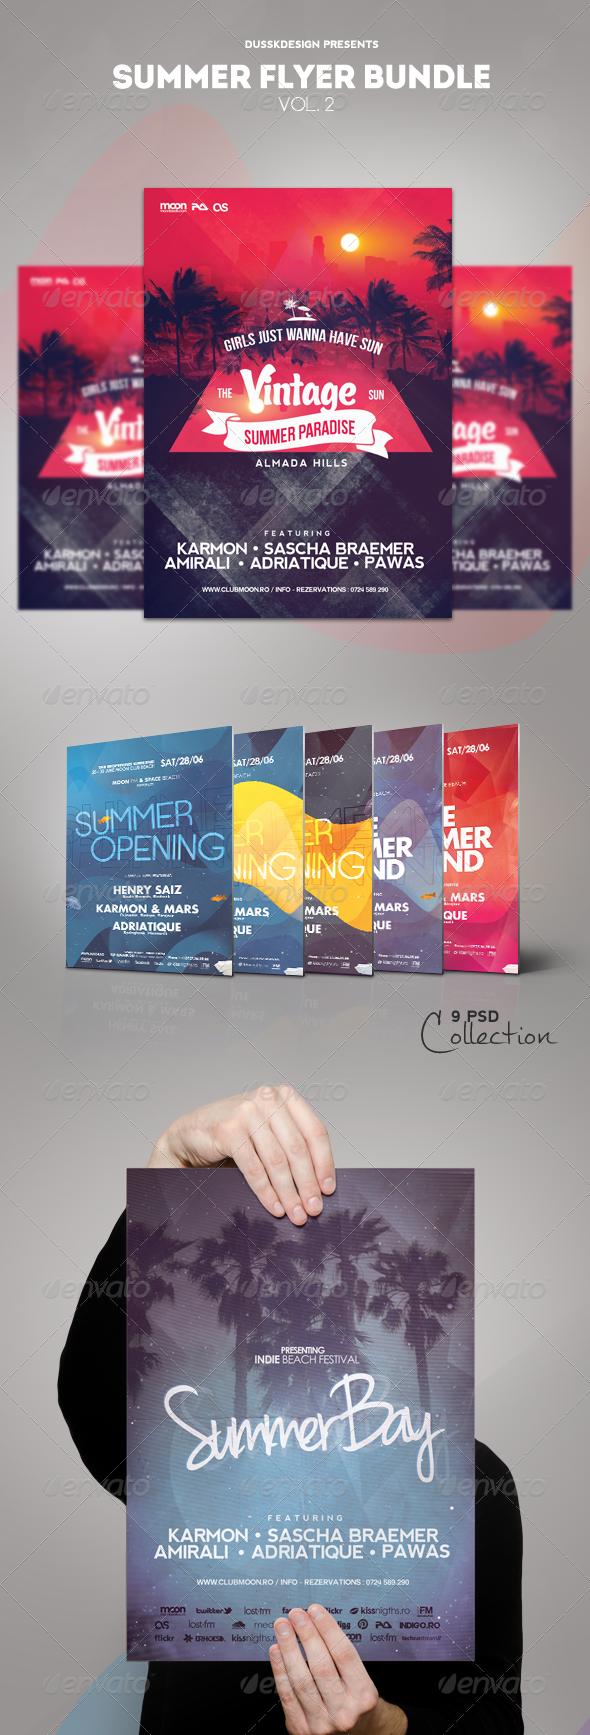 GraphicRiver Summer Flyer Bundle Vol 2 5425483